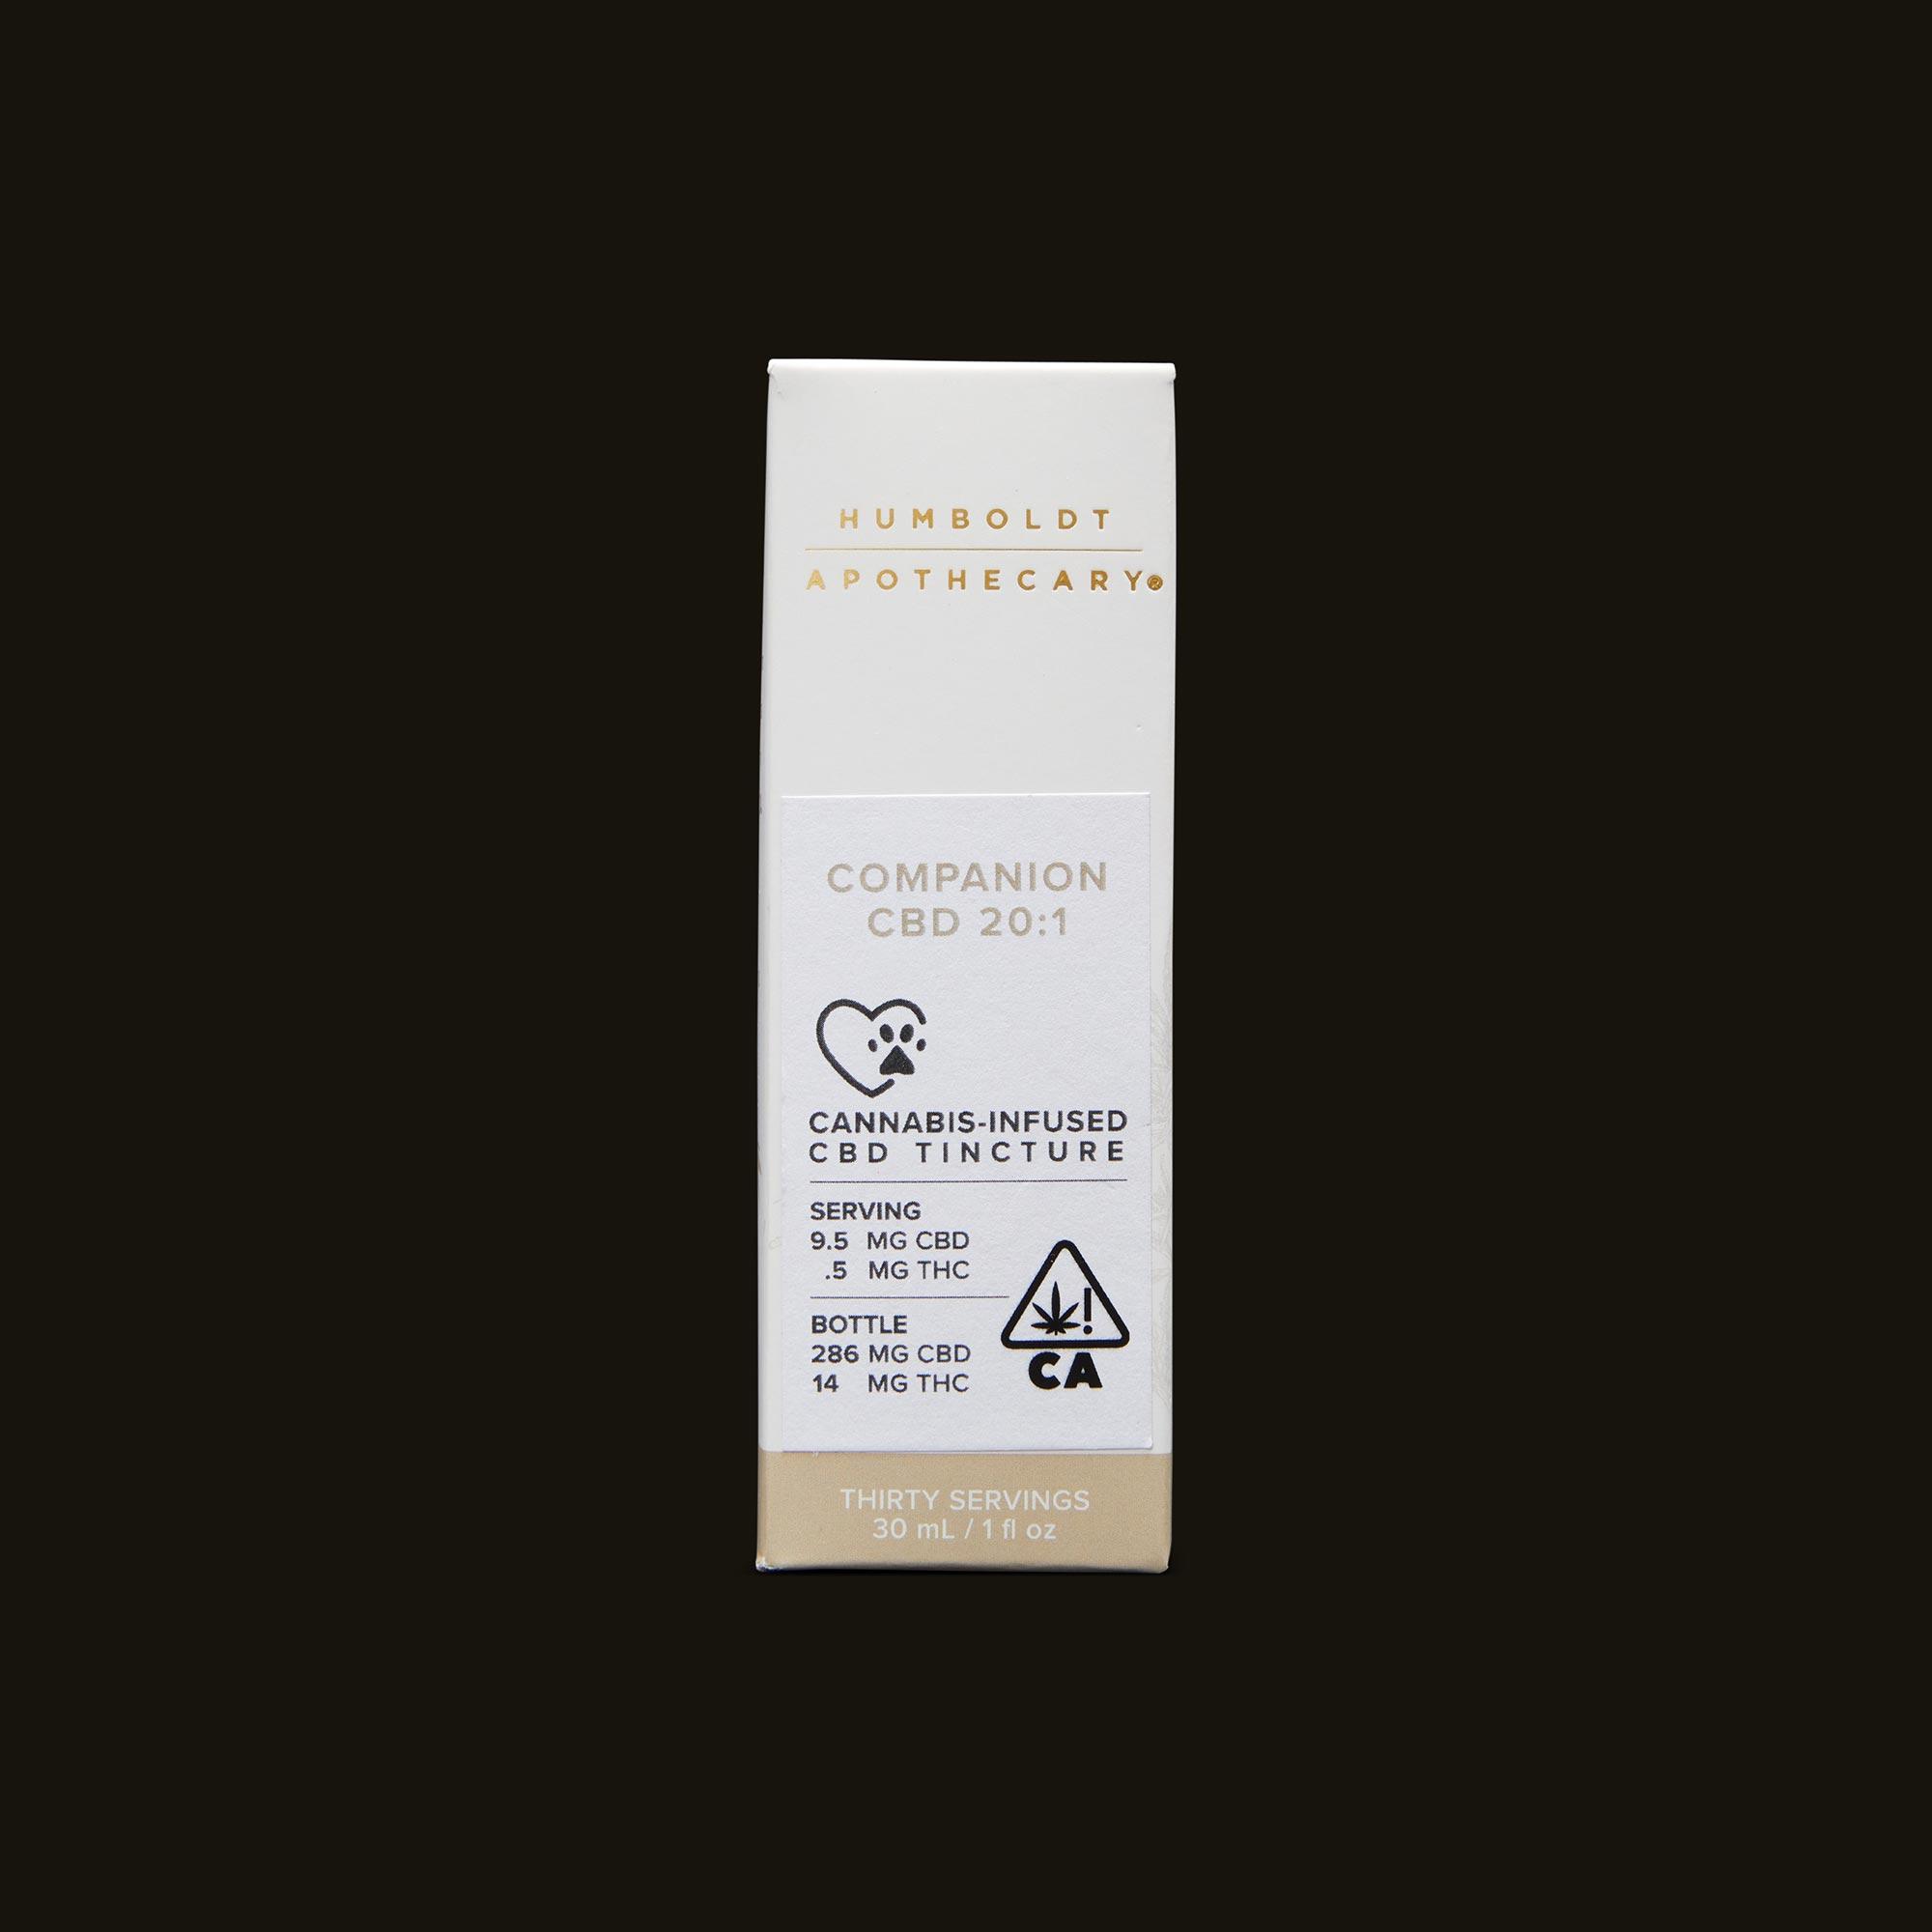 Humboldt Apothecary Pet CBD 20:1 Front Packaging